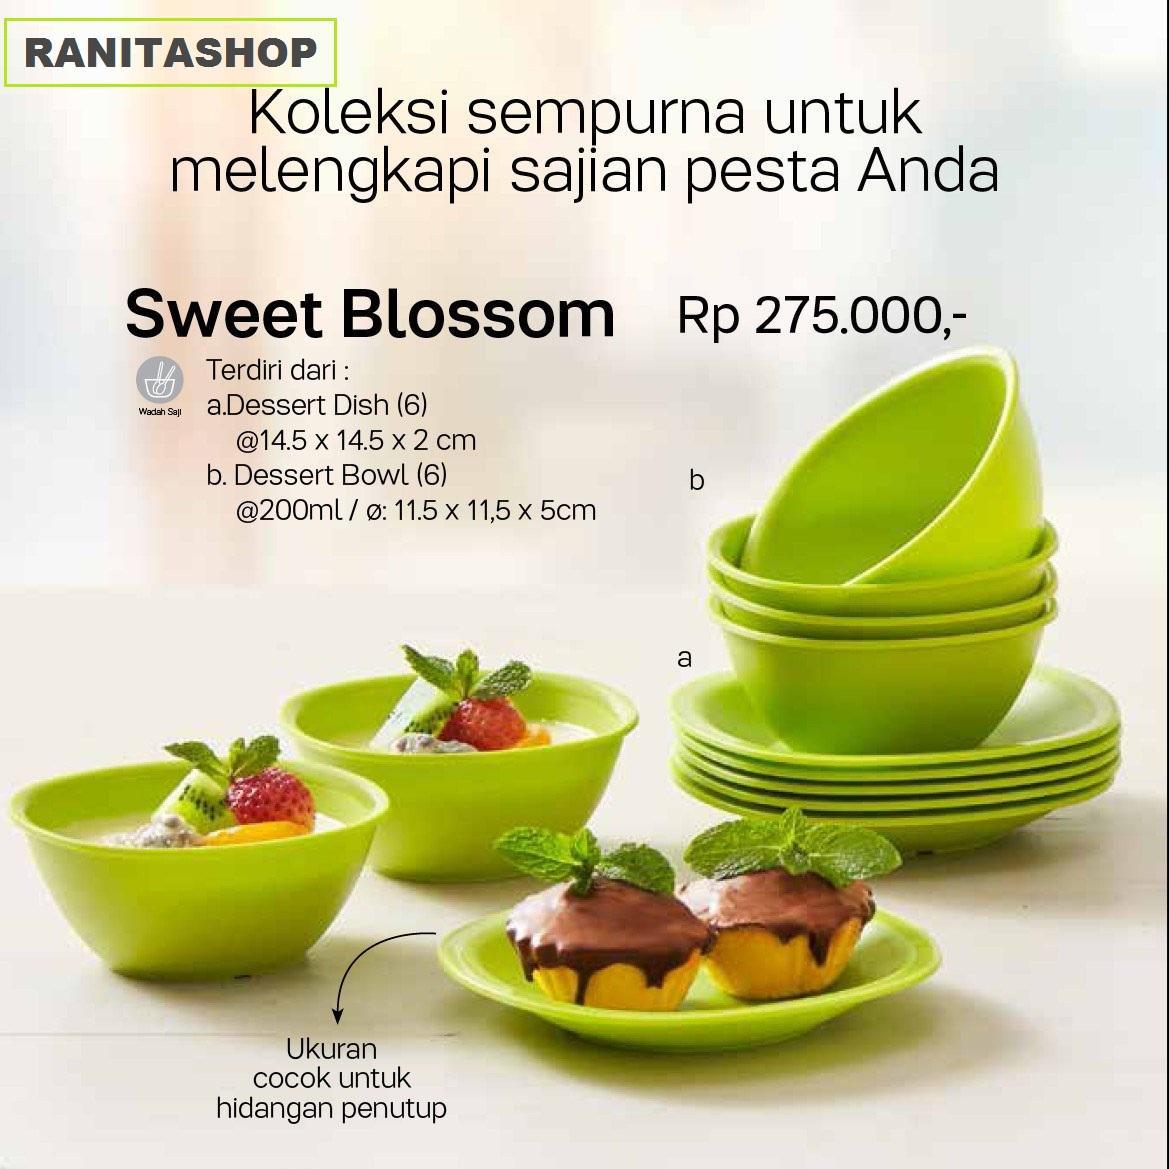 Tupperware Sweet Blossom - Dapat 1 set isi 12pcs - GRATIS ONGKIR seluruh  pulau jawa - 814f0f6f1b